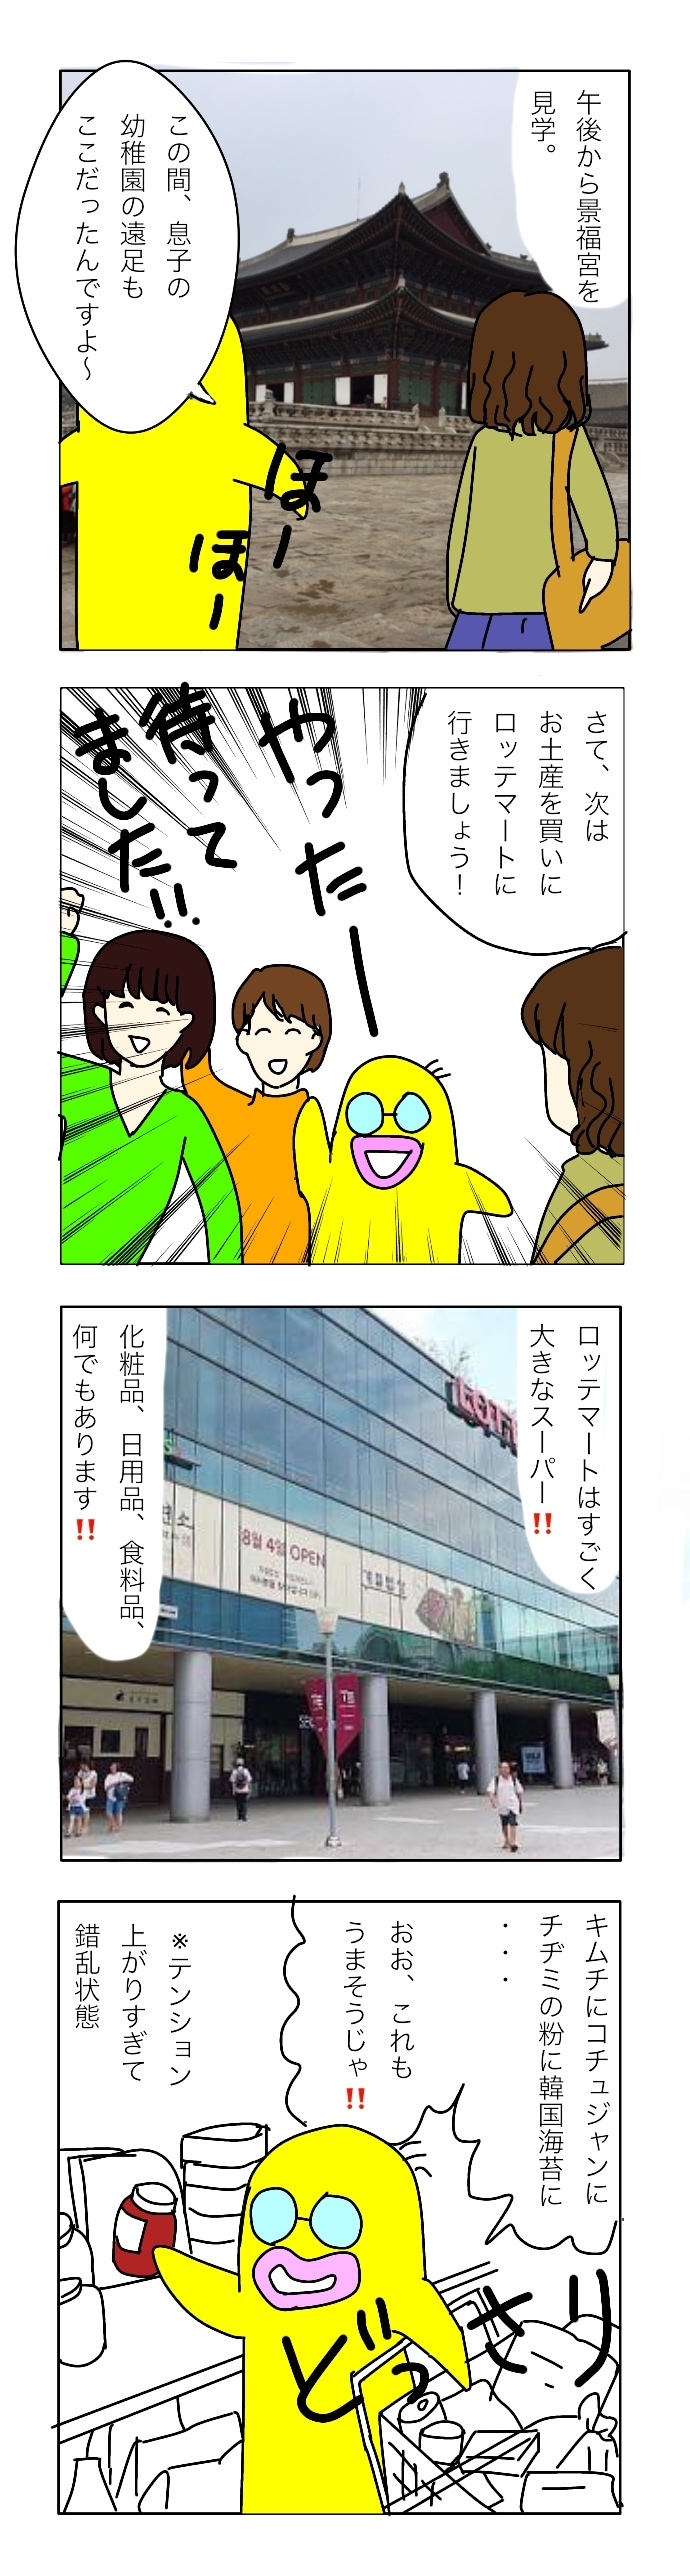 kankoku6 ロッテマート